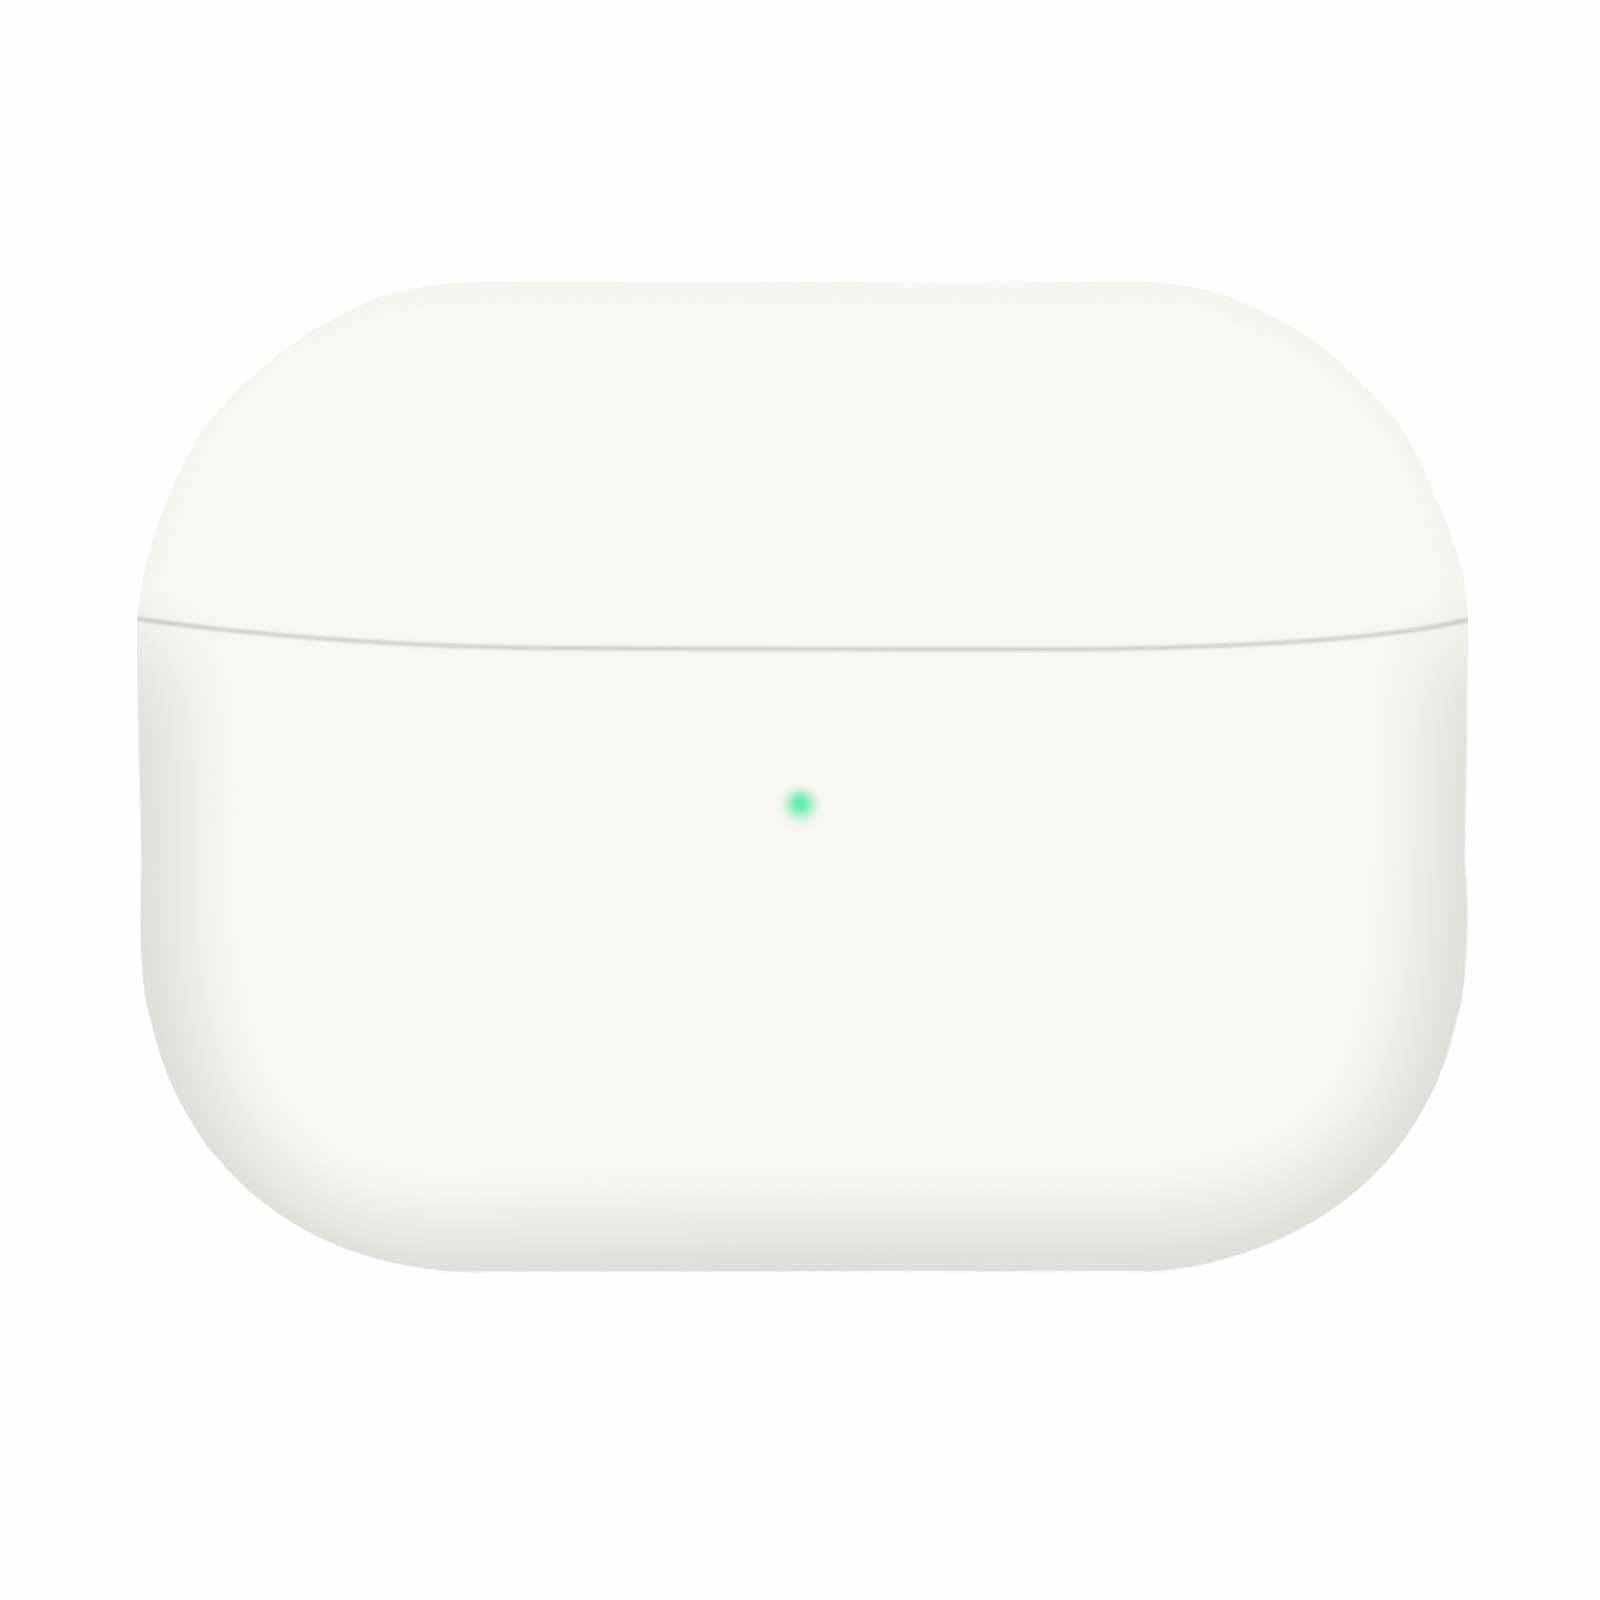 Avizar Coque Blanc pour Apple AirPods Pro